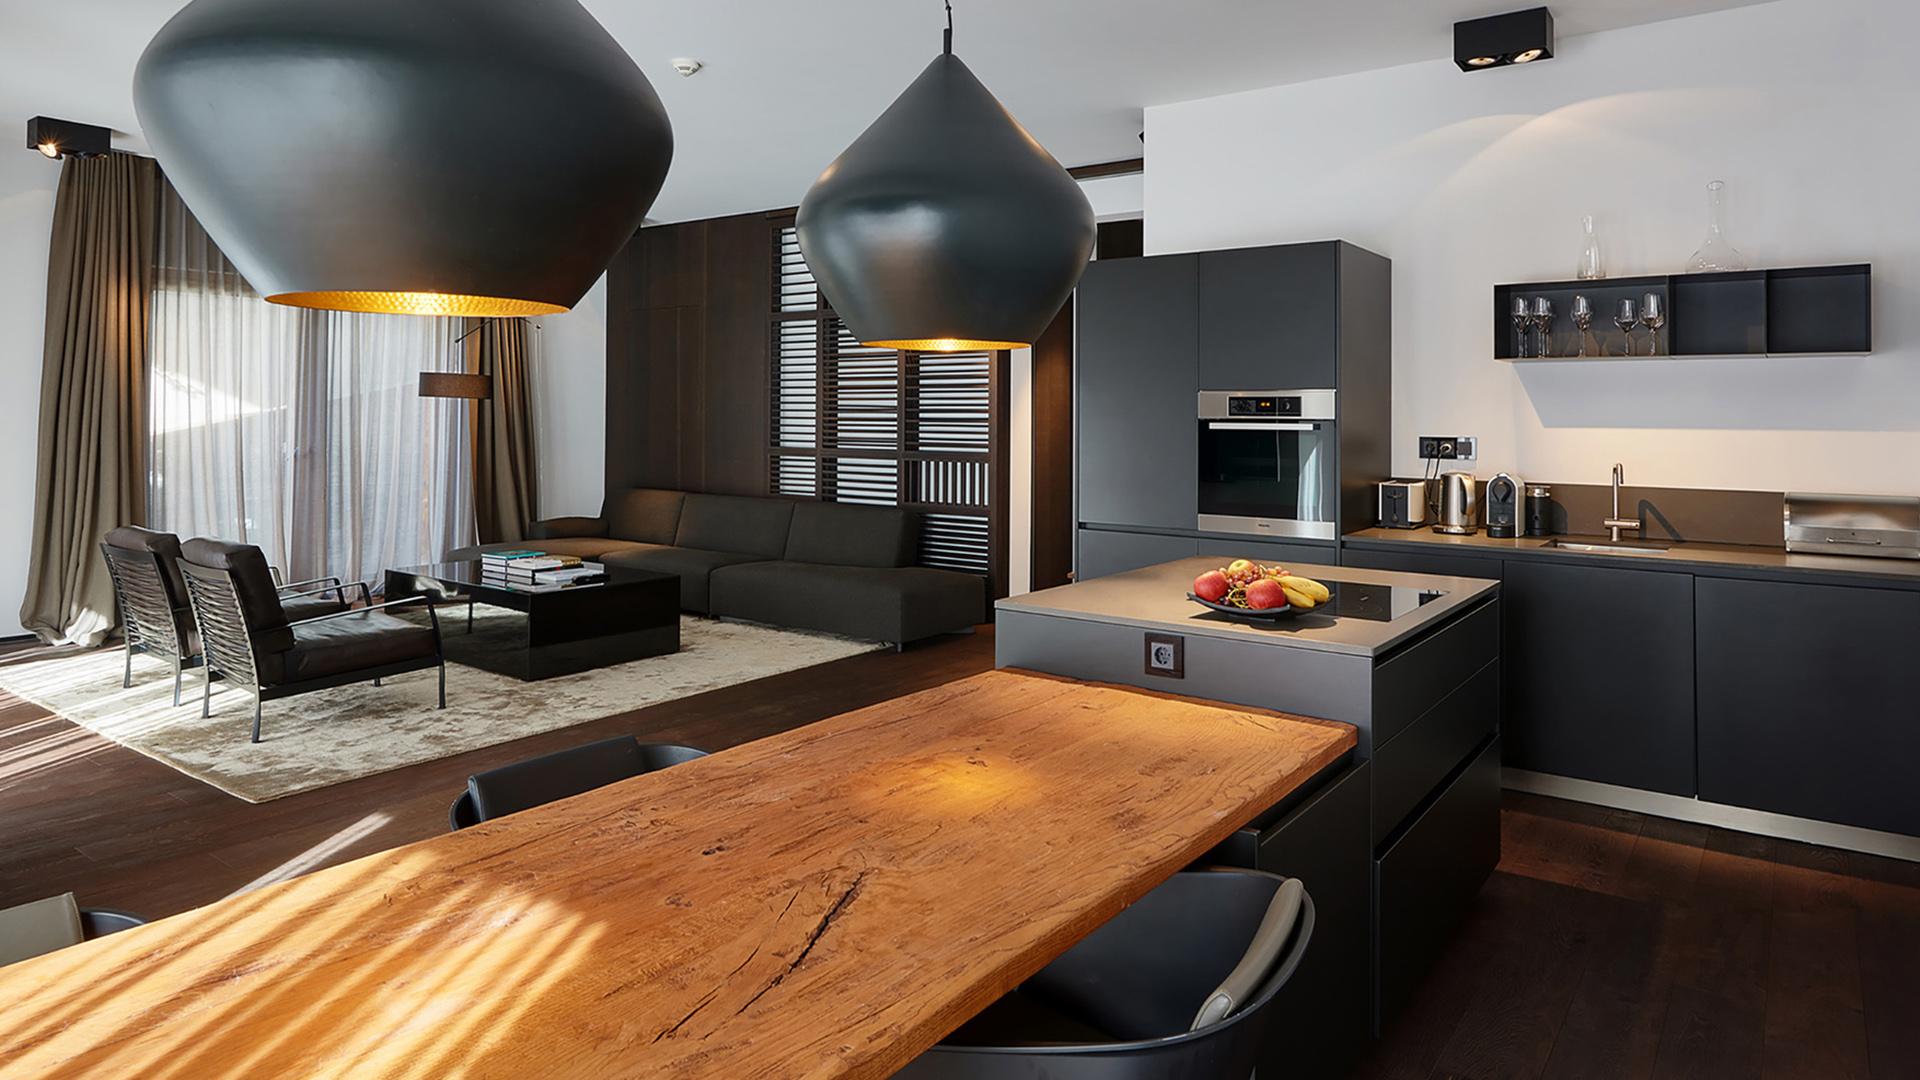 Mathon Apartments Apartments, Austria